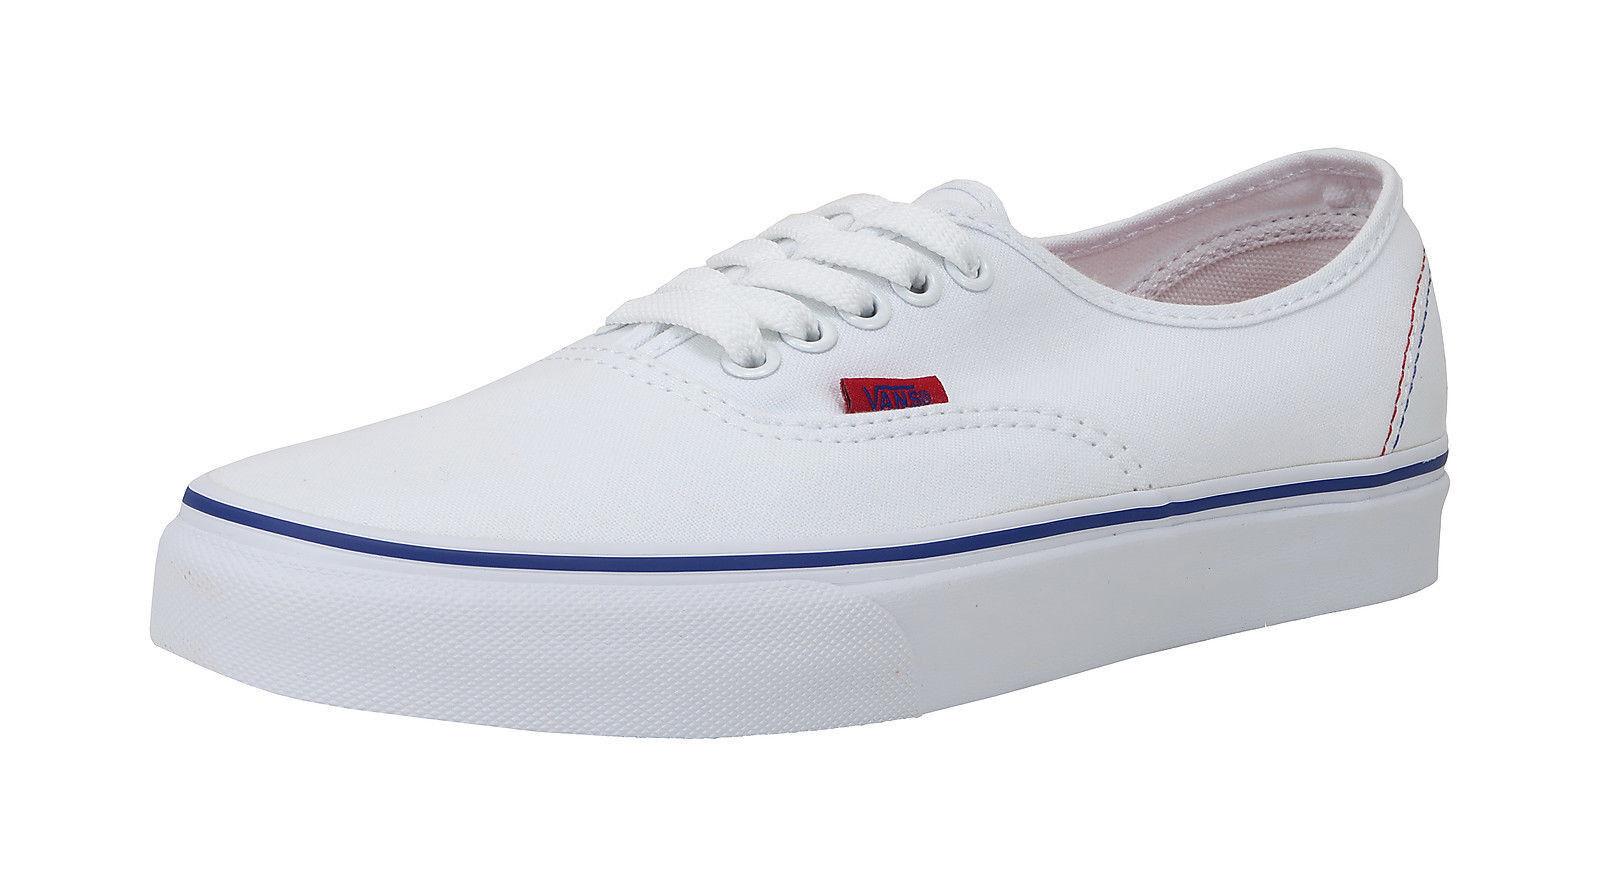 Vans Men Women Adult shoes Authentic Solstice 2016 True White Red bluee